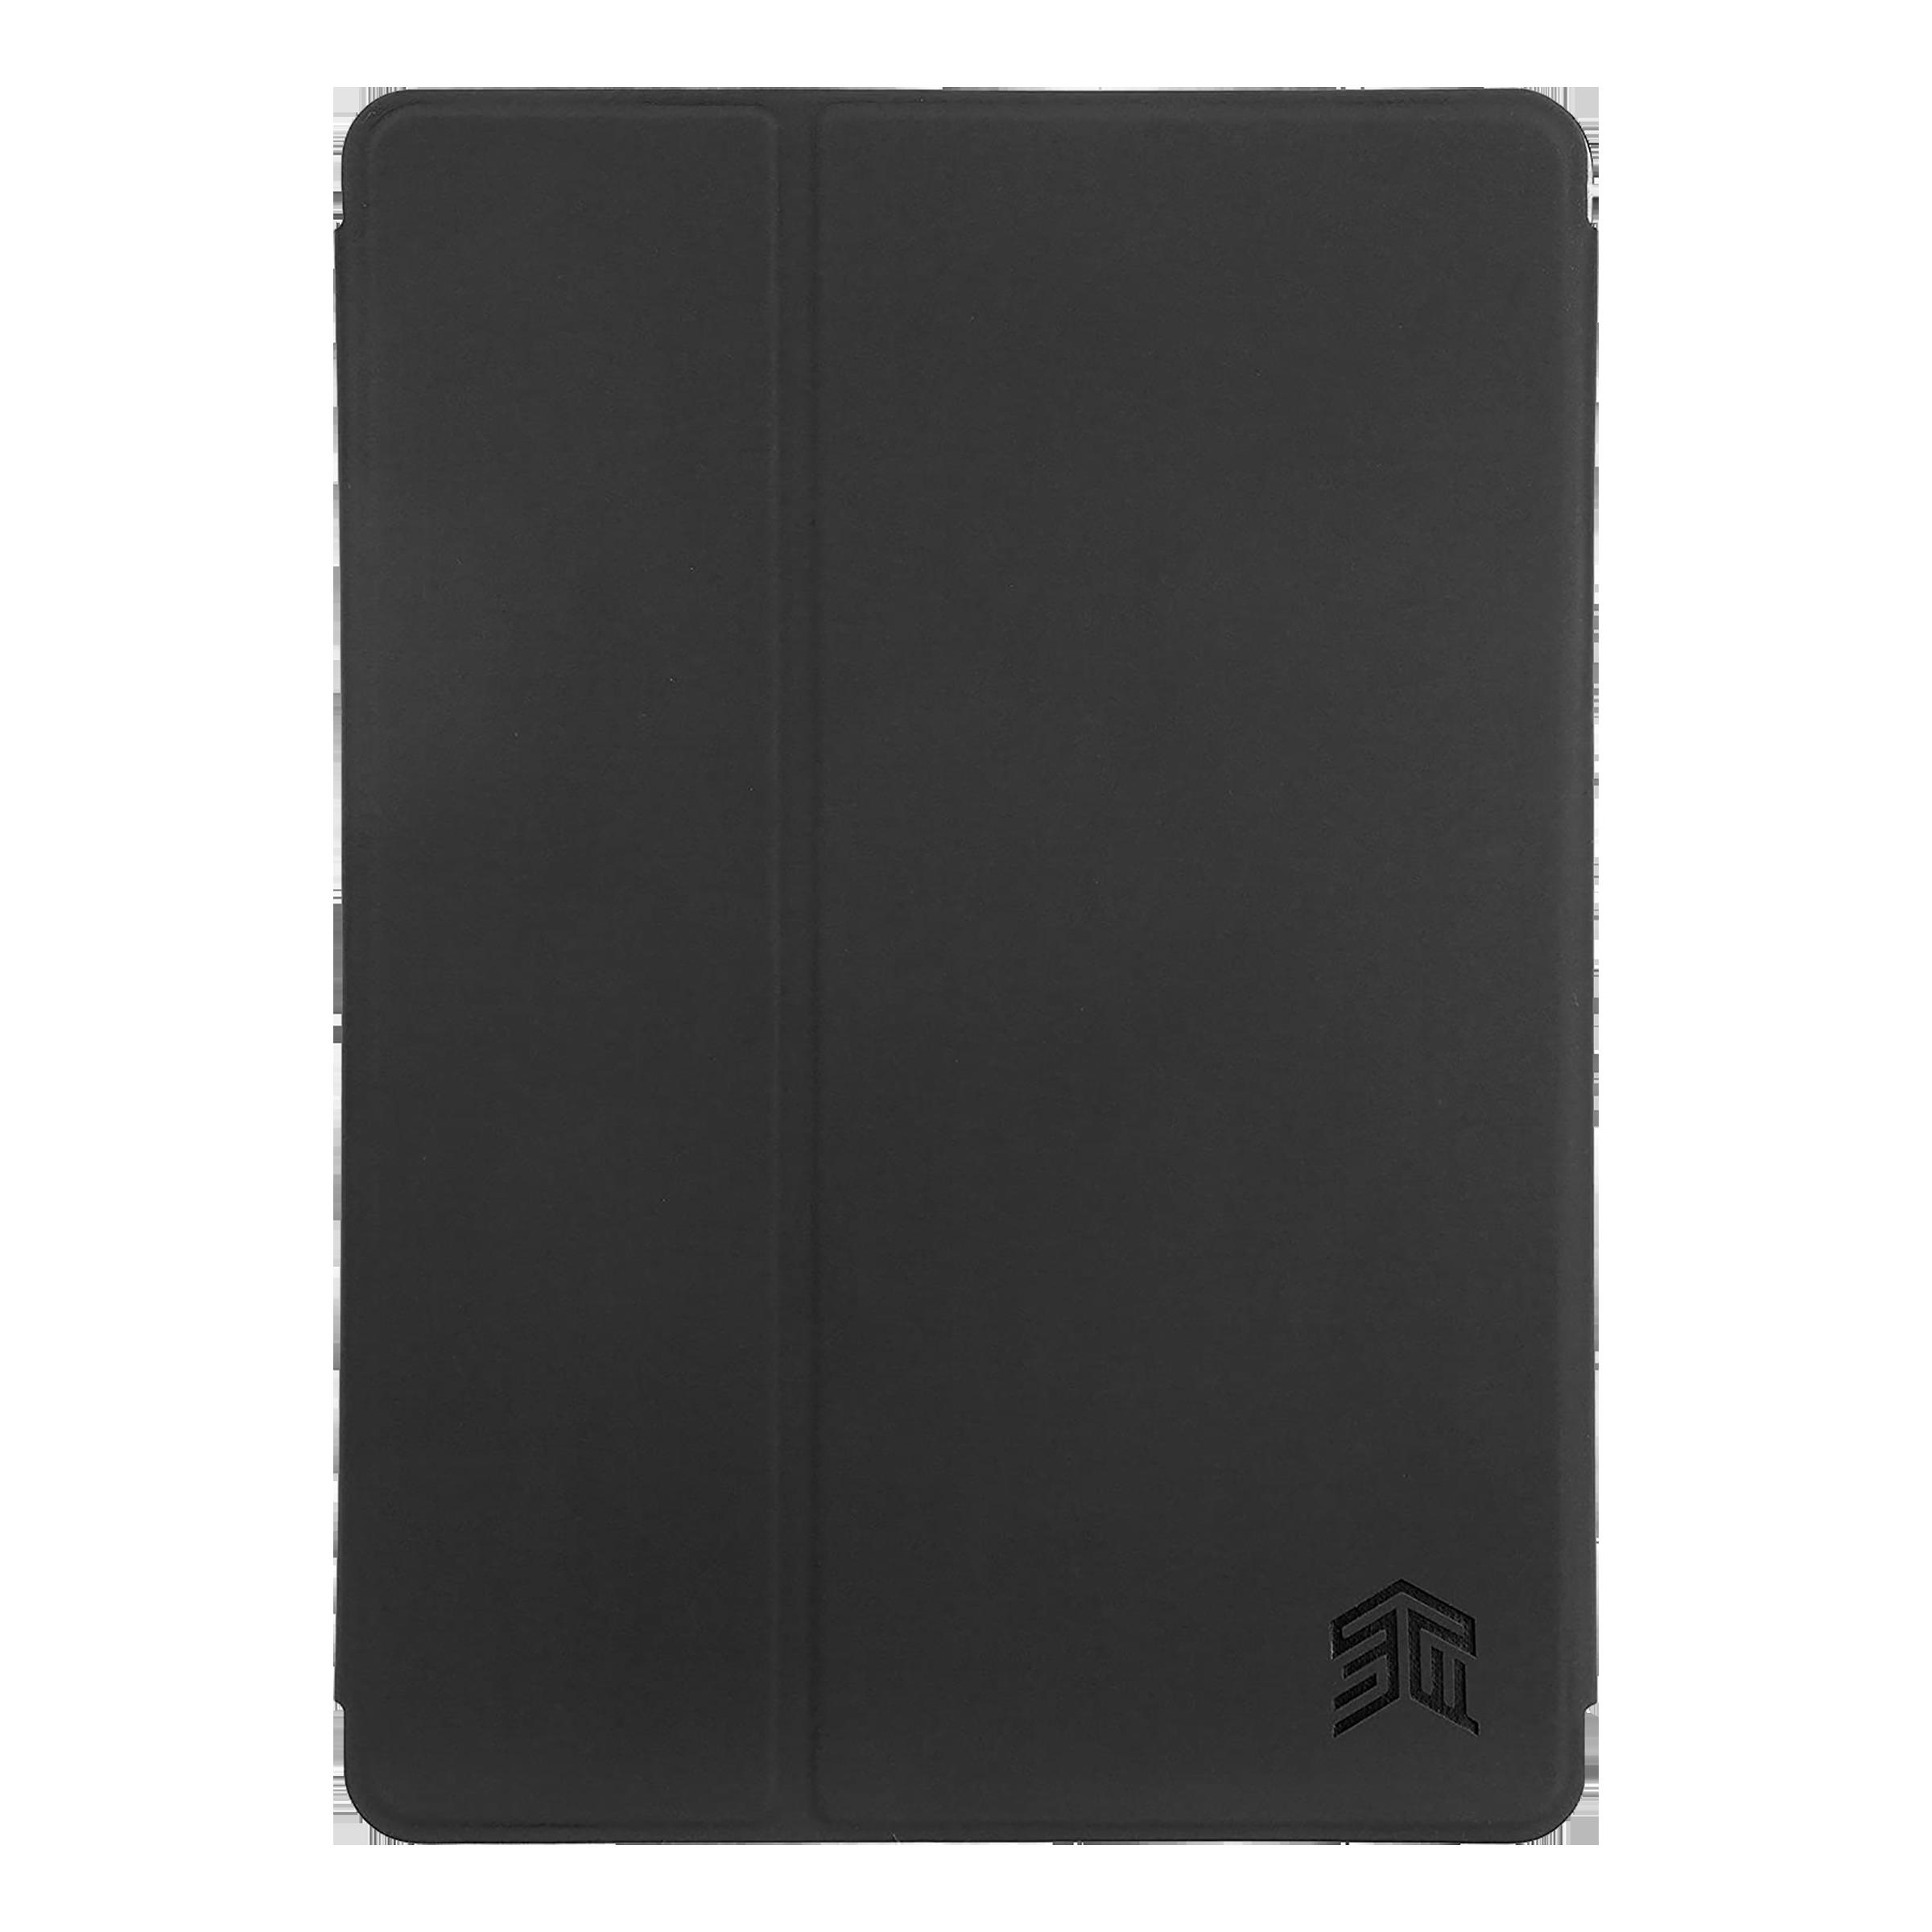 STM Studio Polycarbonate Flip Case with Stand For iPad 9.7 (5th Gen/ 6th Gen) / Pro 9.7 (Multi Fit Design, STM-222-161JW-01, Black Smoke)_1